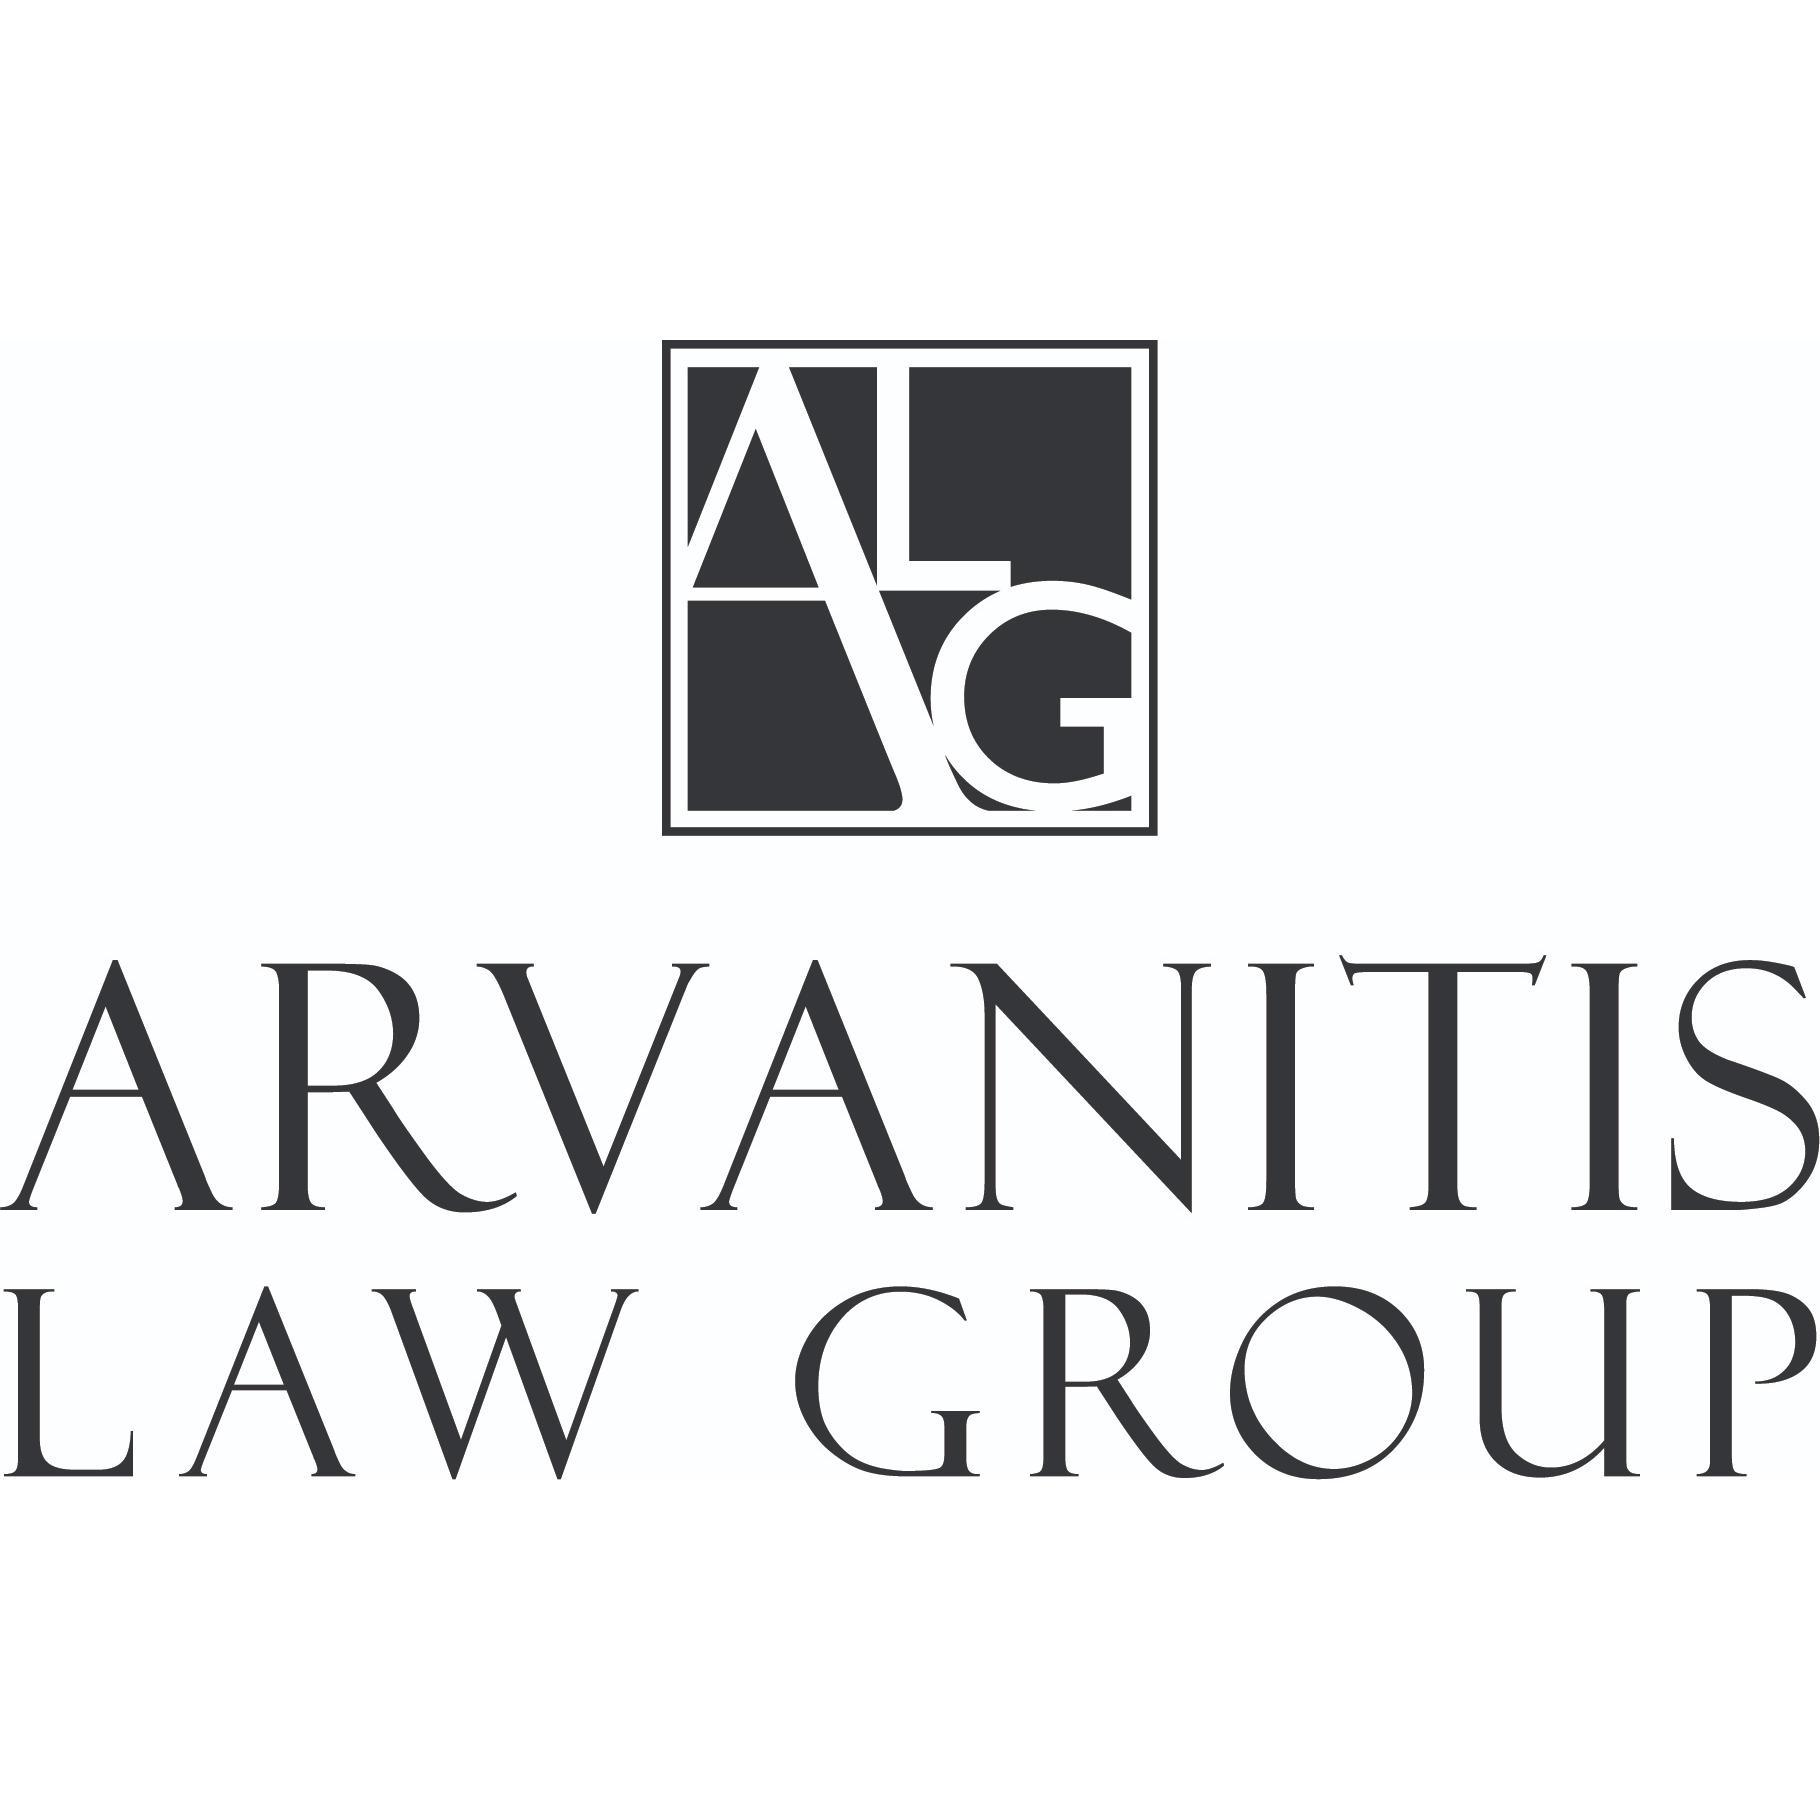 Arvanitis Law Group image 1